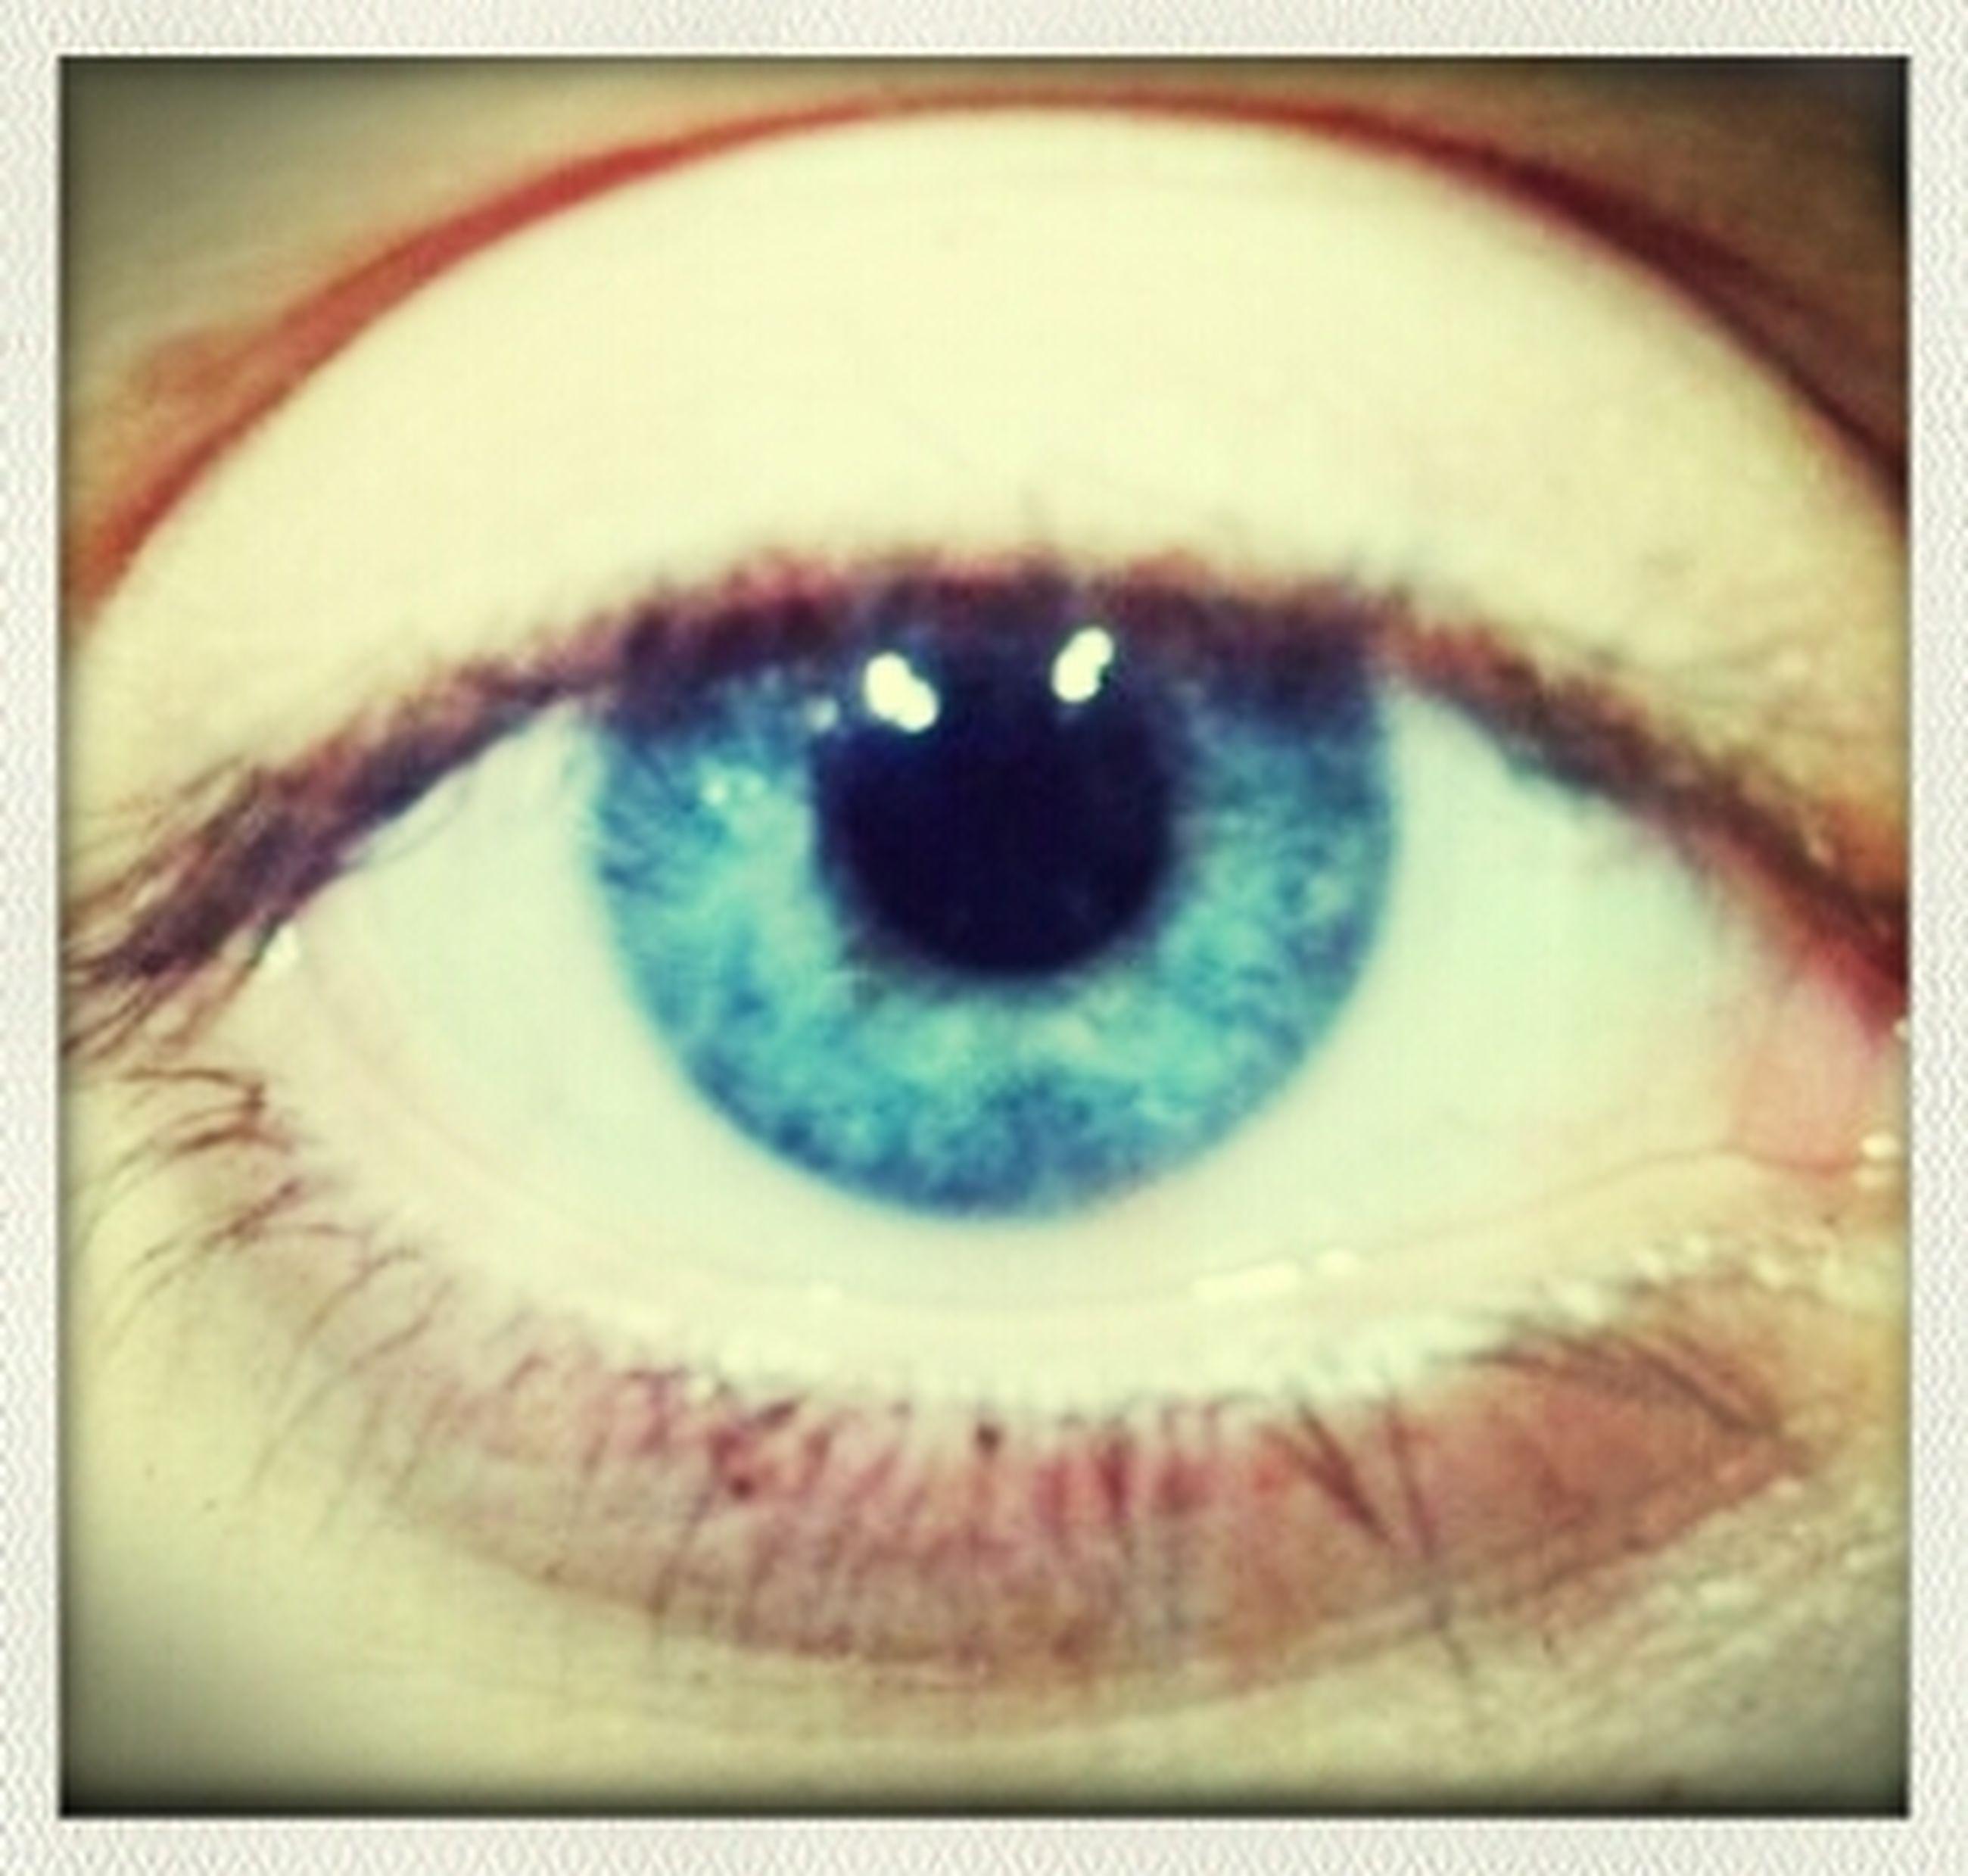 human eye, close-up, eyelash, eyesight, sensory perception, extreme close-up, part of, indoors, iris - eye, eyeball, auto post production filter, unrecognizable person, human skin, portrait, extreme close up, transfer print, full frame